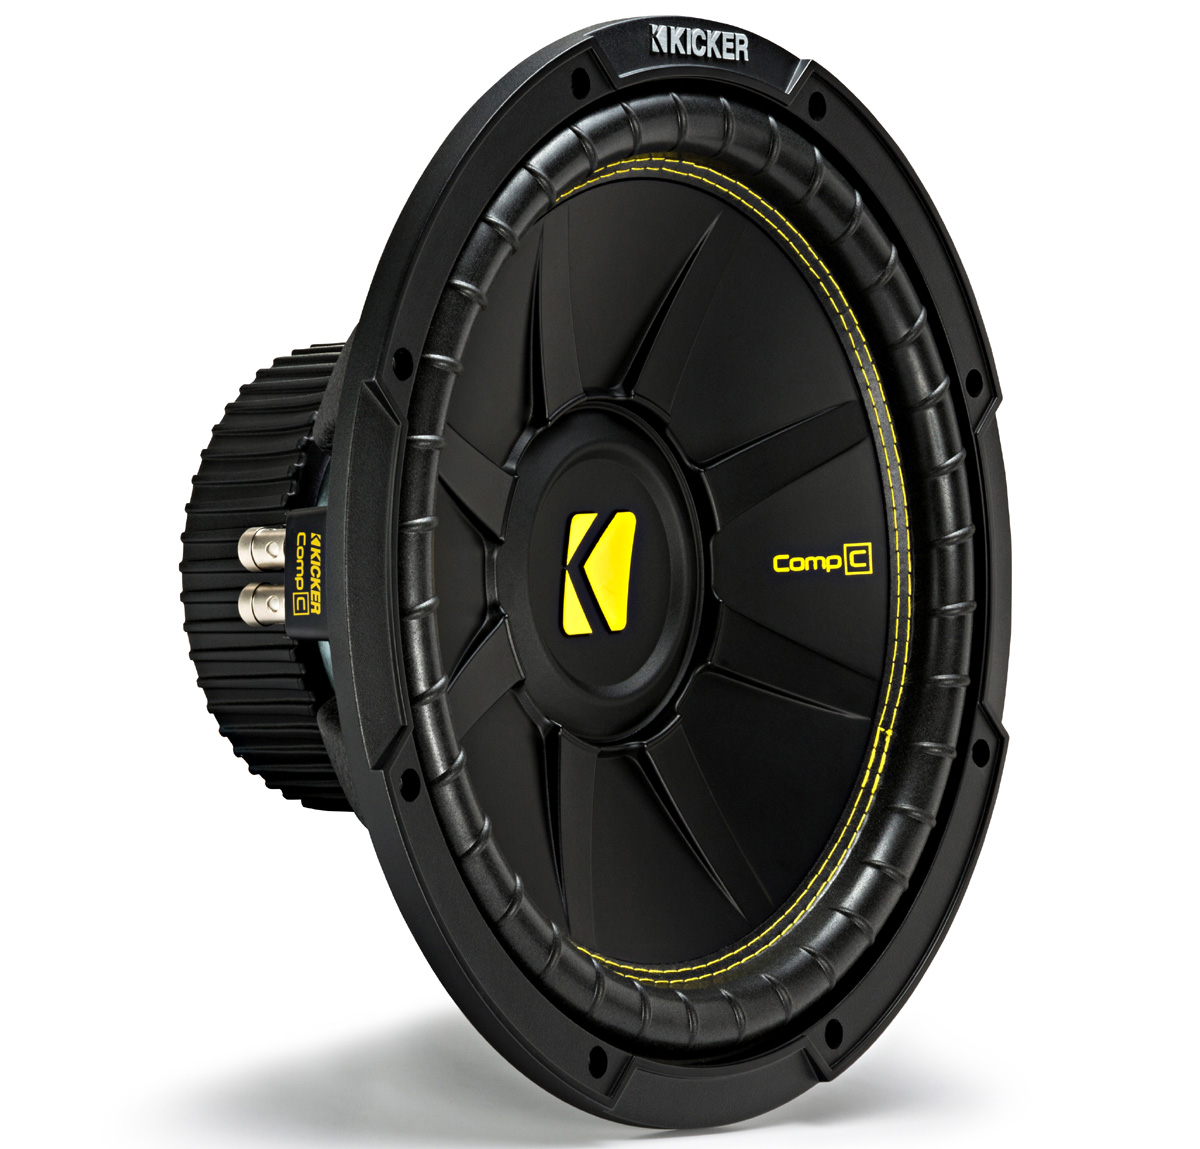 "Kicker CWD12 Car Audio CompC Subwoofer Dual 4 Ohm 12"" Sub 44CWCD124 Brand New"